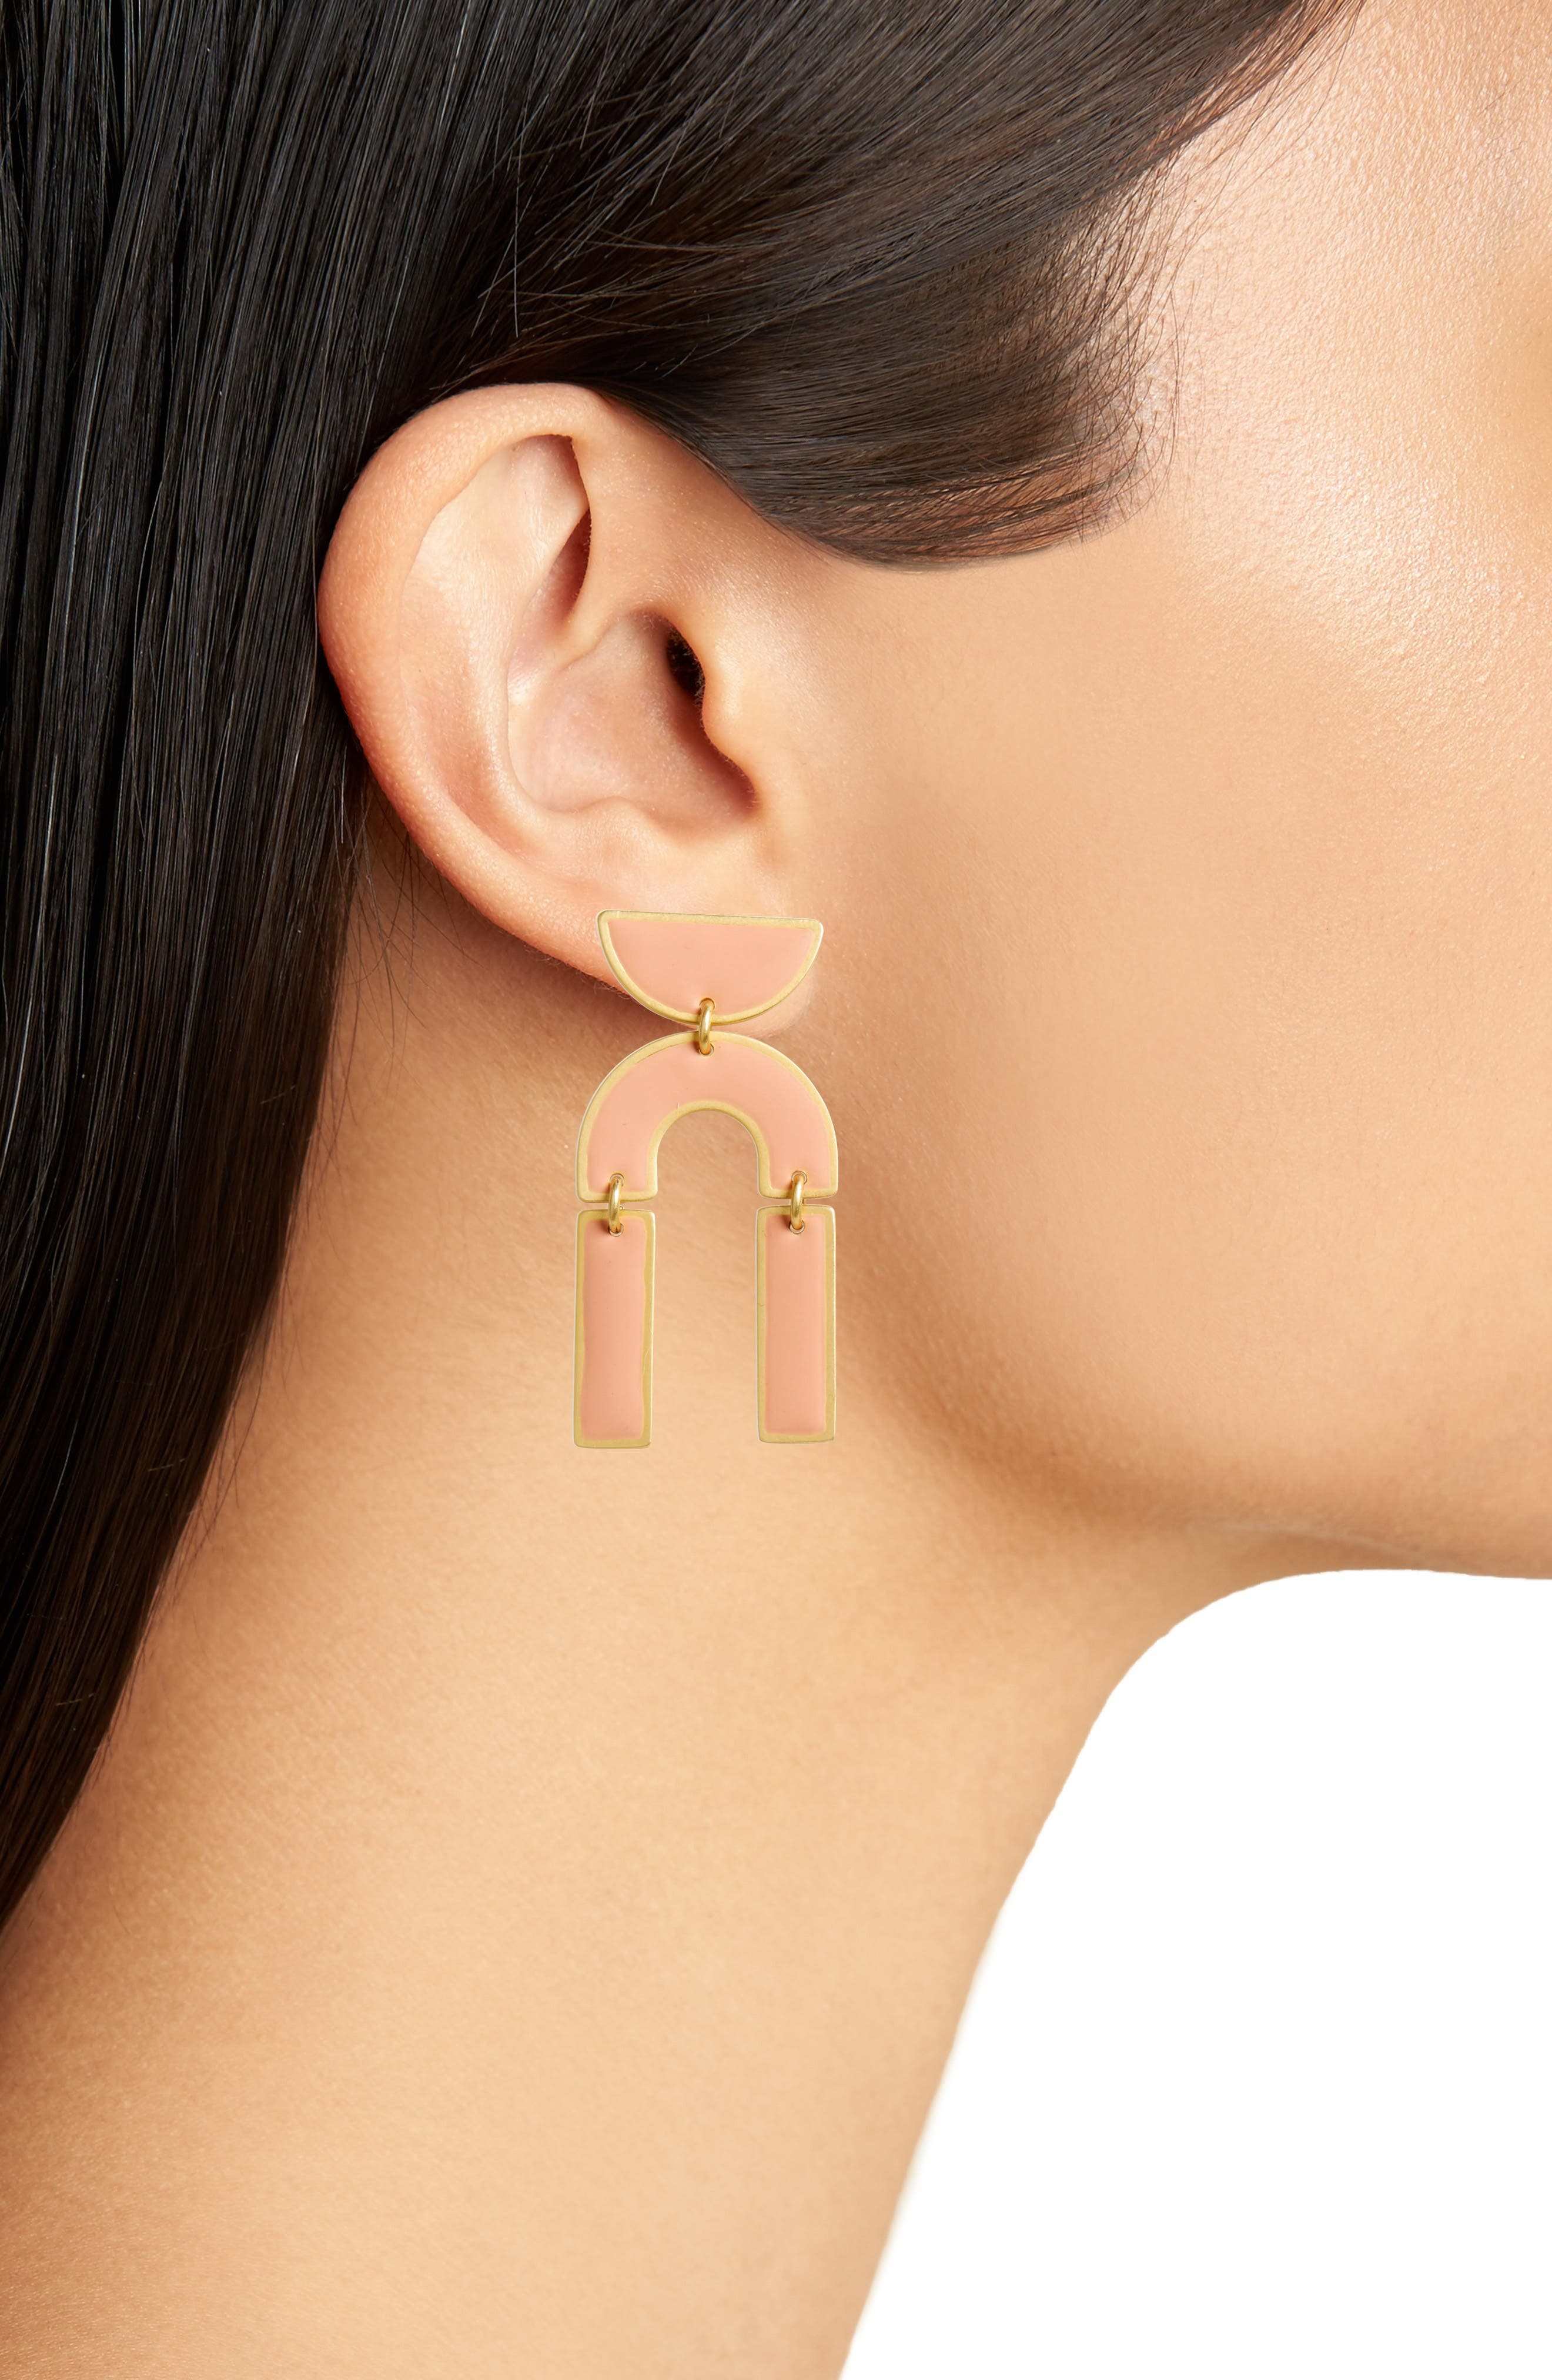 Modernism Half-Drop Earrings,                             Alternate thumbnail 2, color,                             710